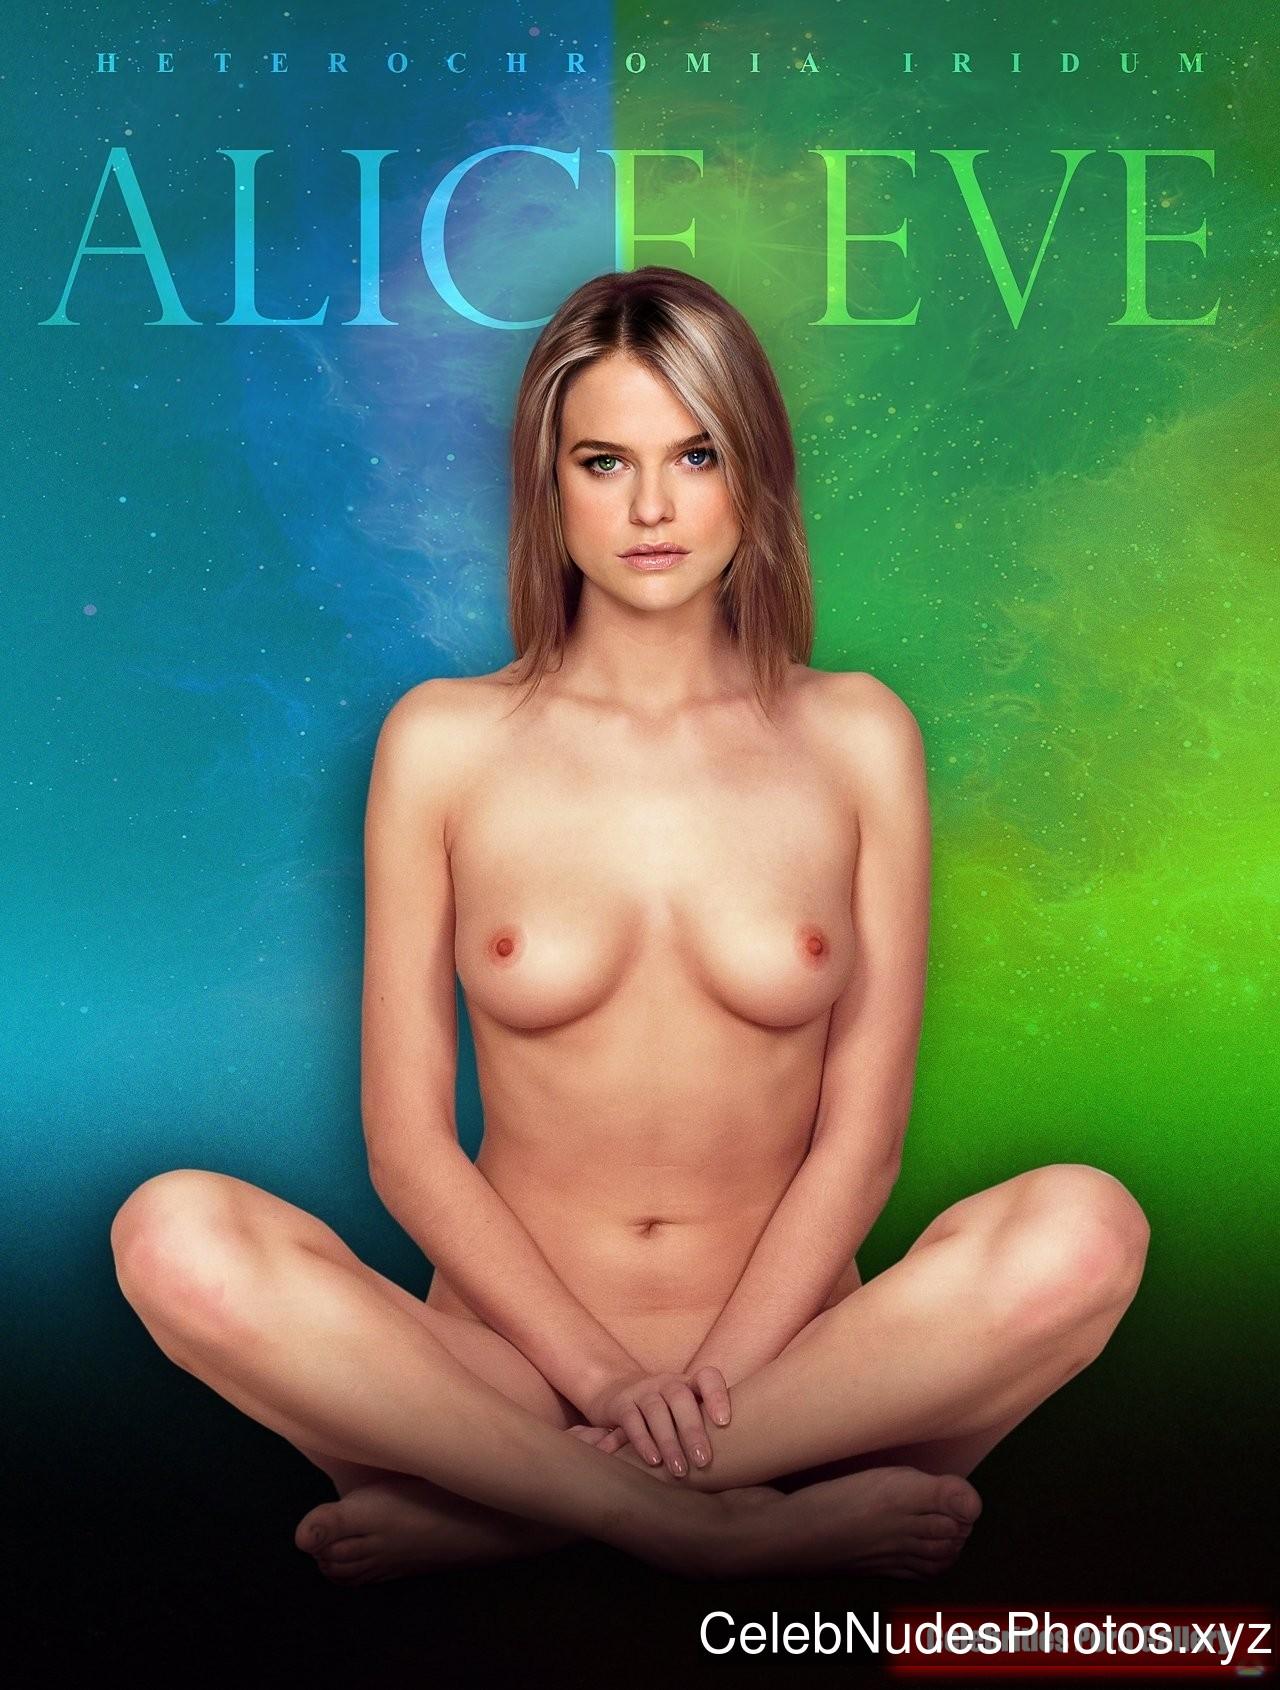 Alice Eve Celebrity Leaked Nude Photo sexy 13